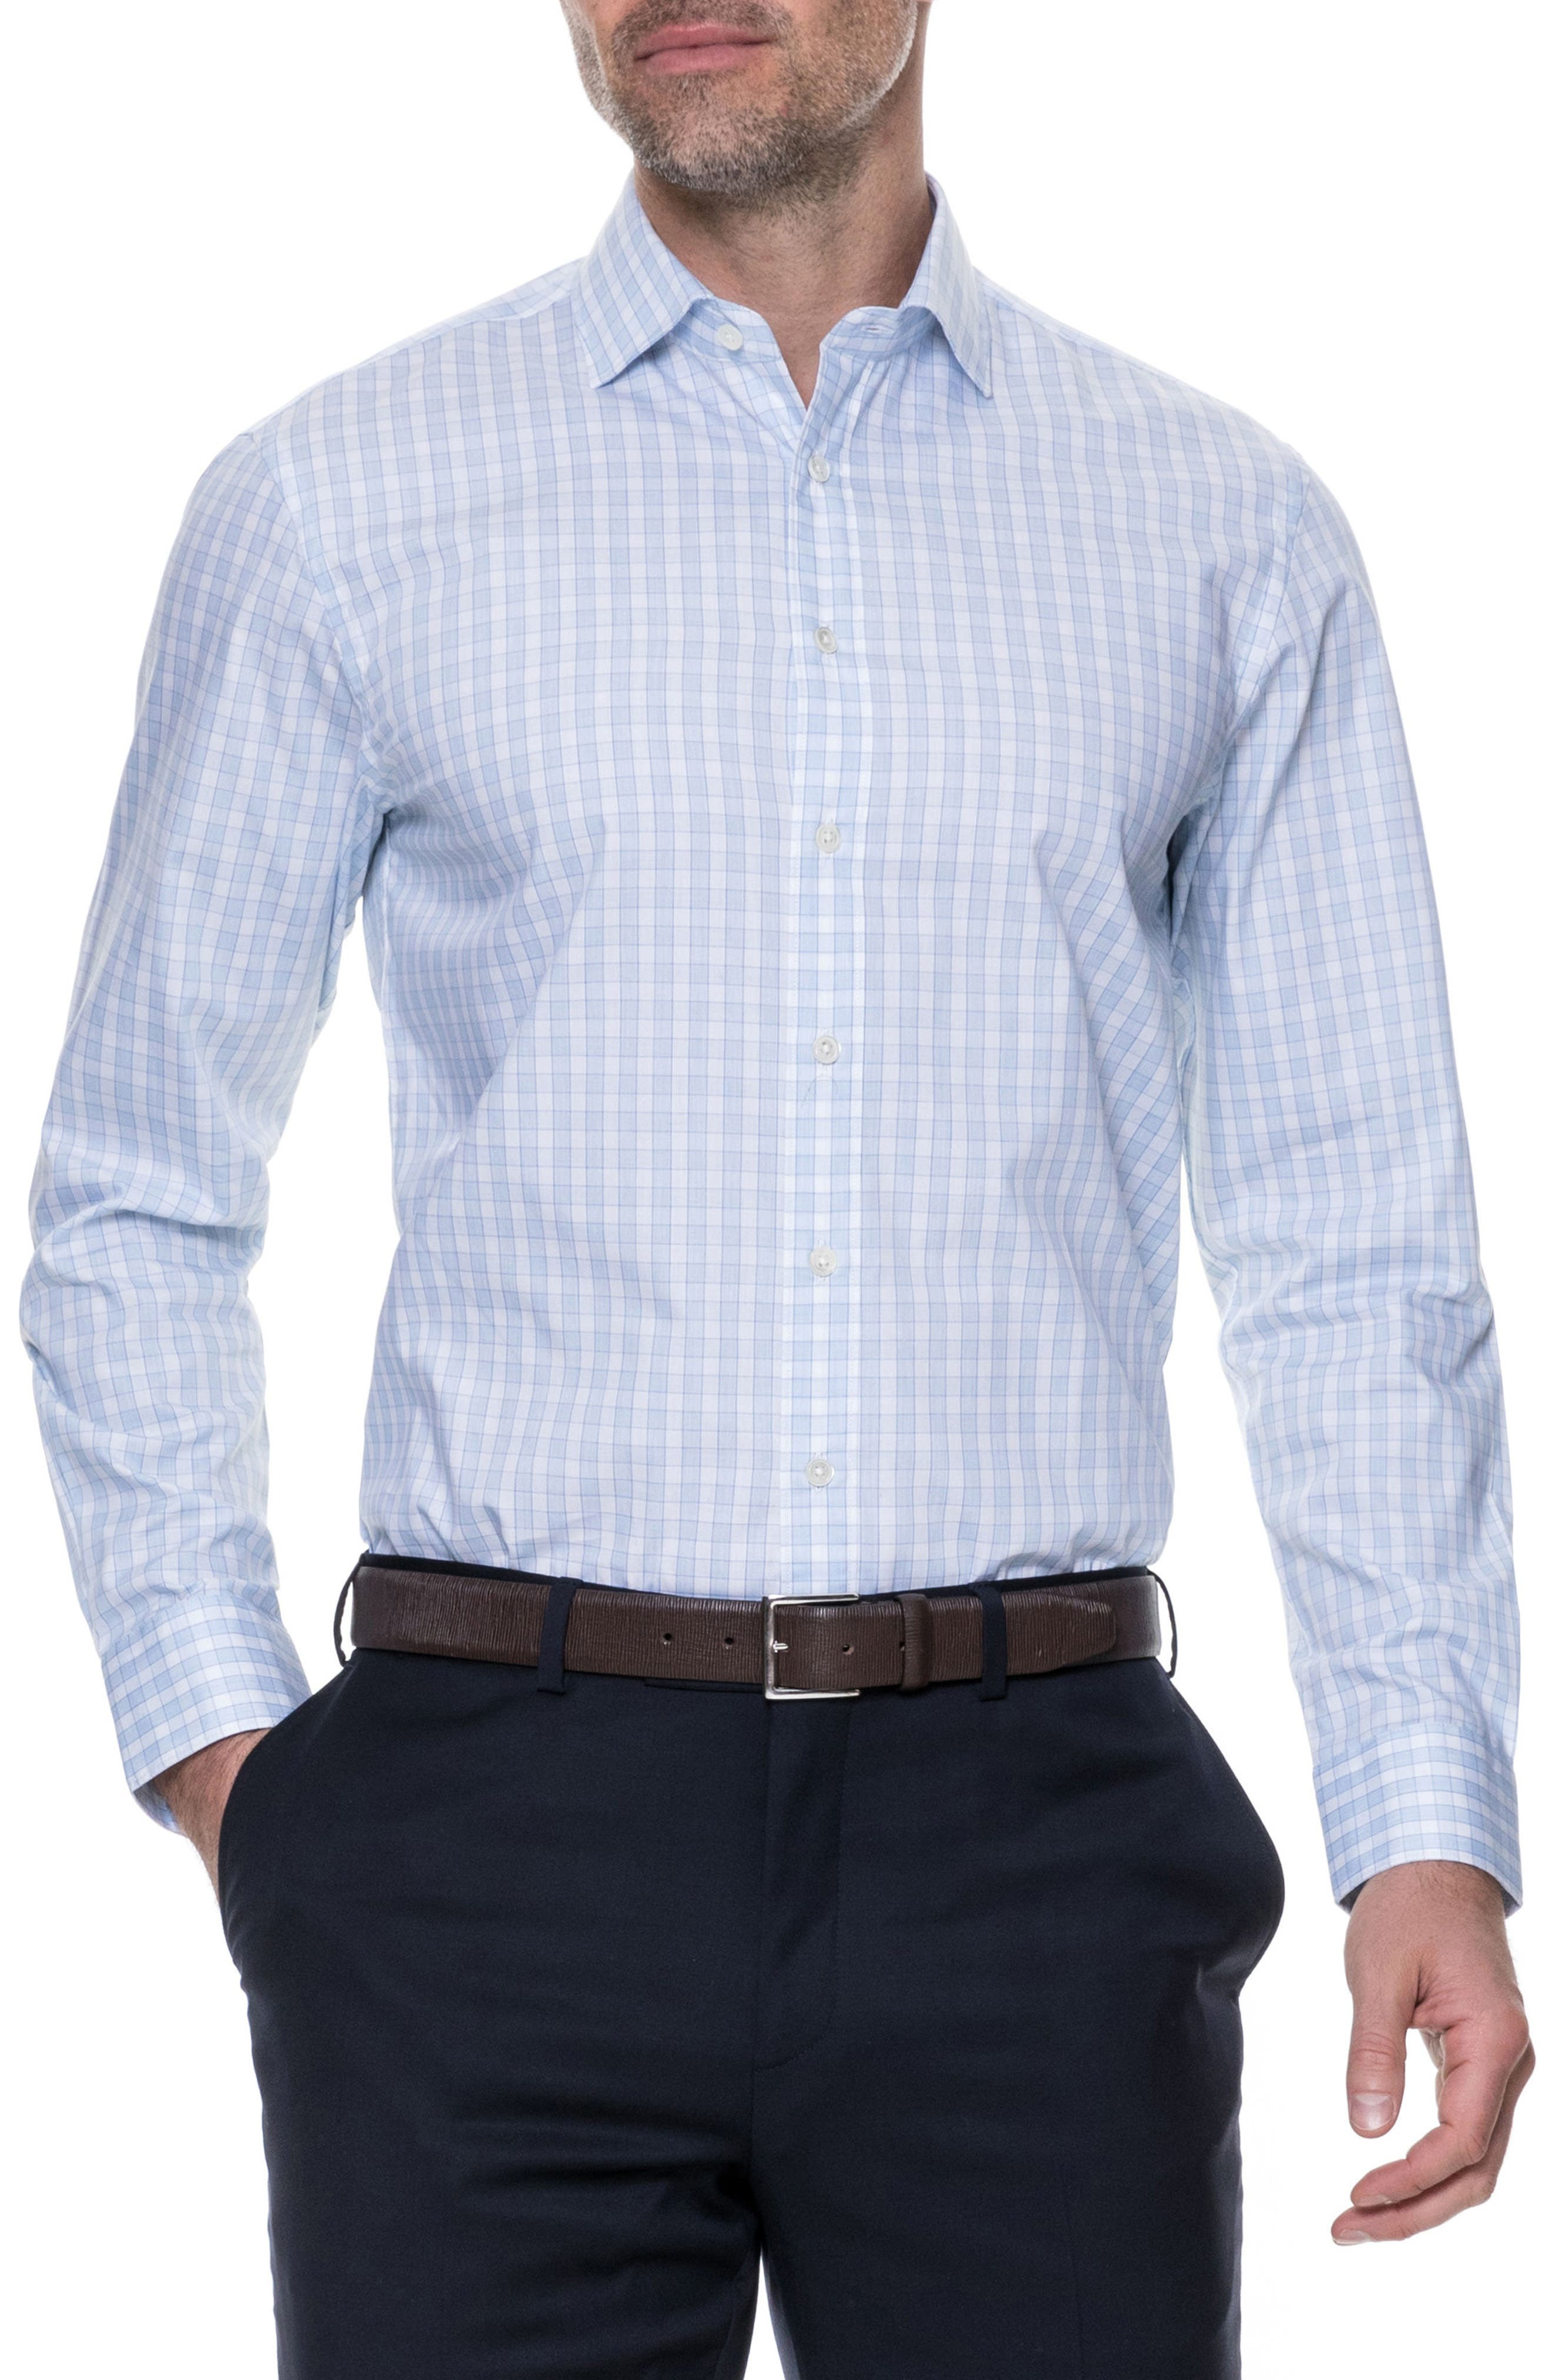 Brackley Slim Fit Sport Shirt,                             Main thumbnail 1, color,